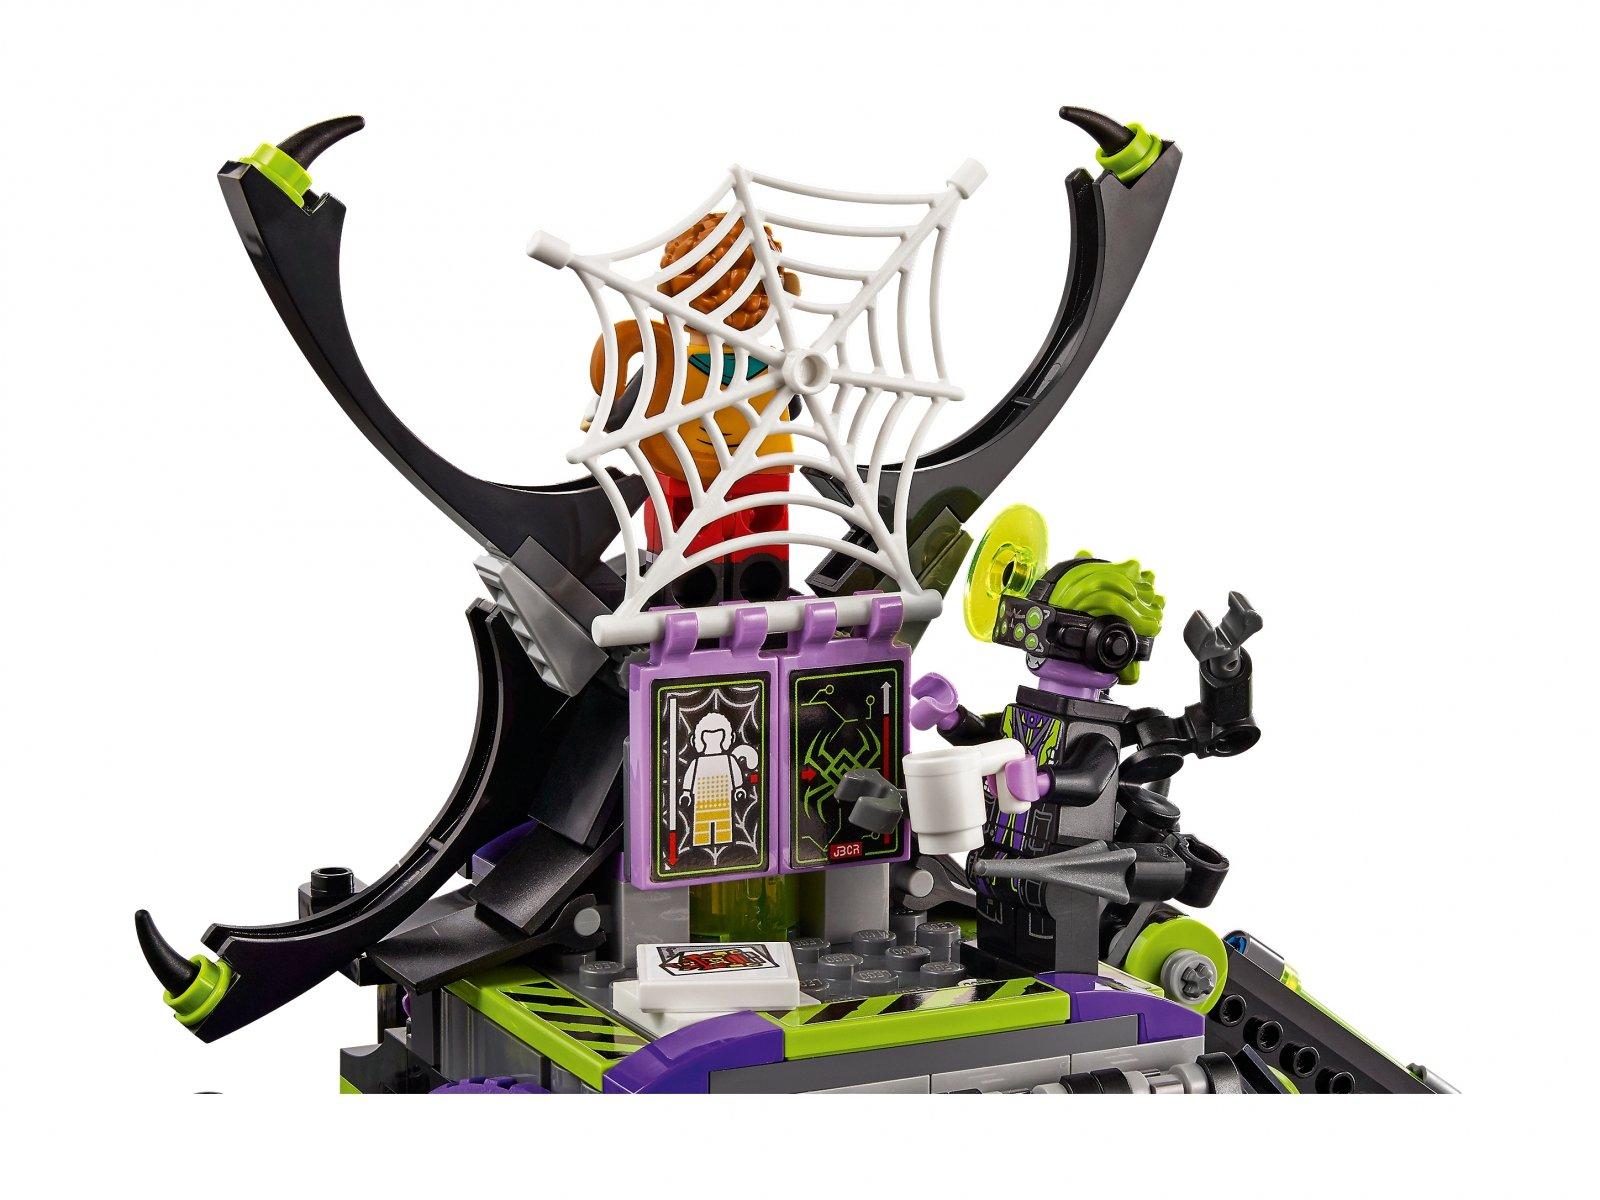 LEGO 80022 Baza arachnoidów Spider Queen